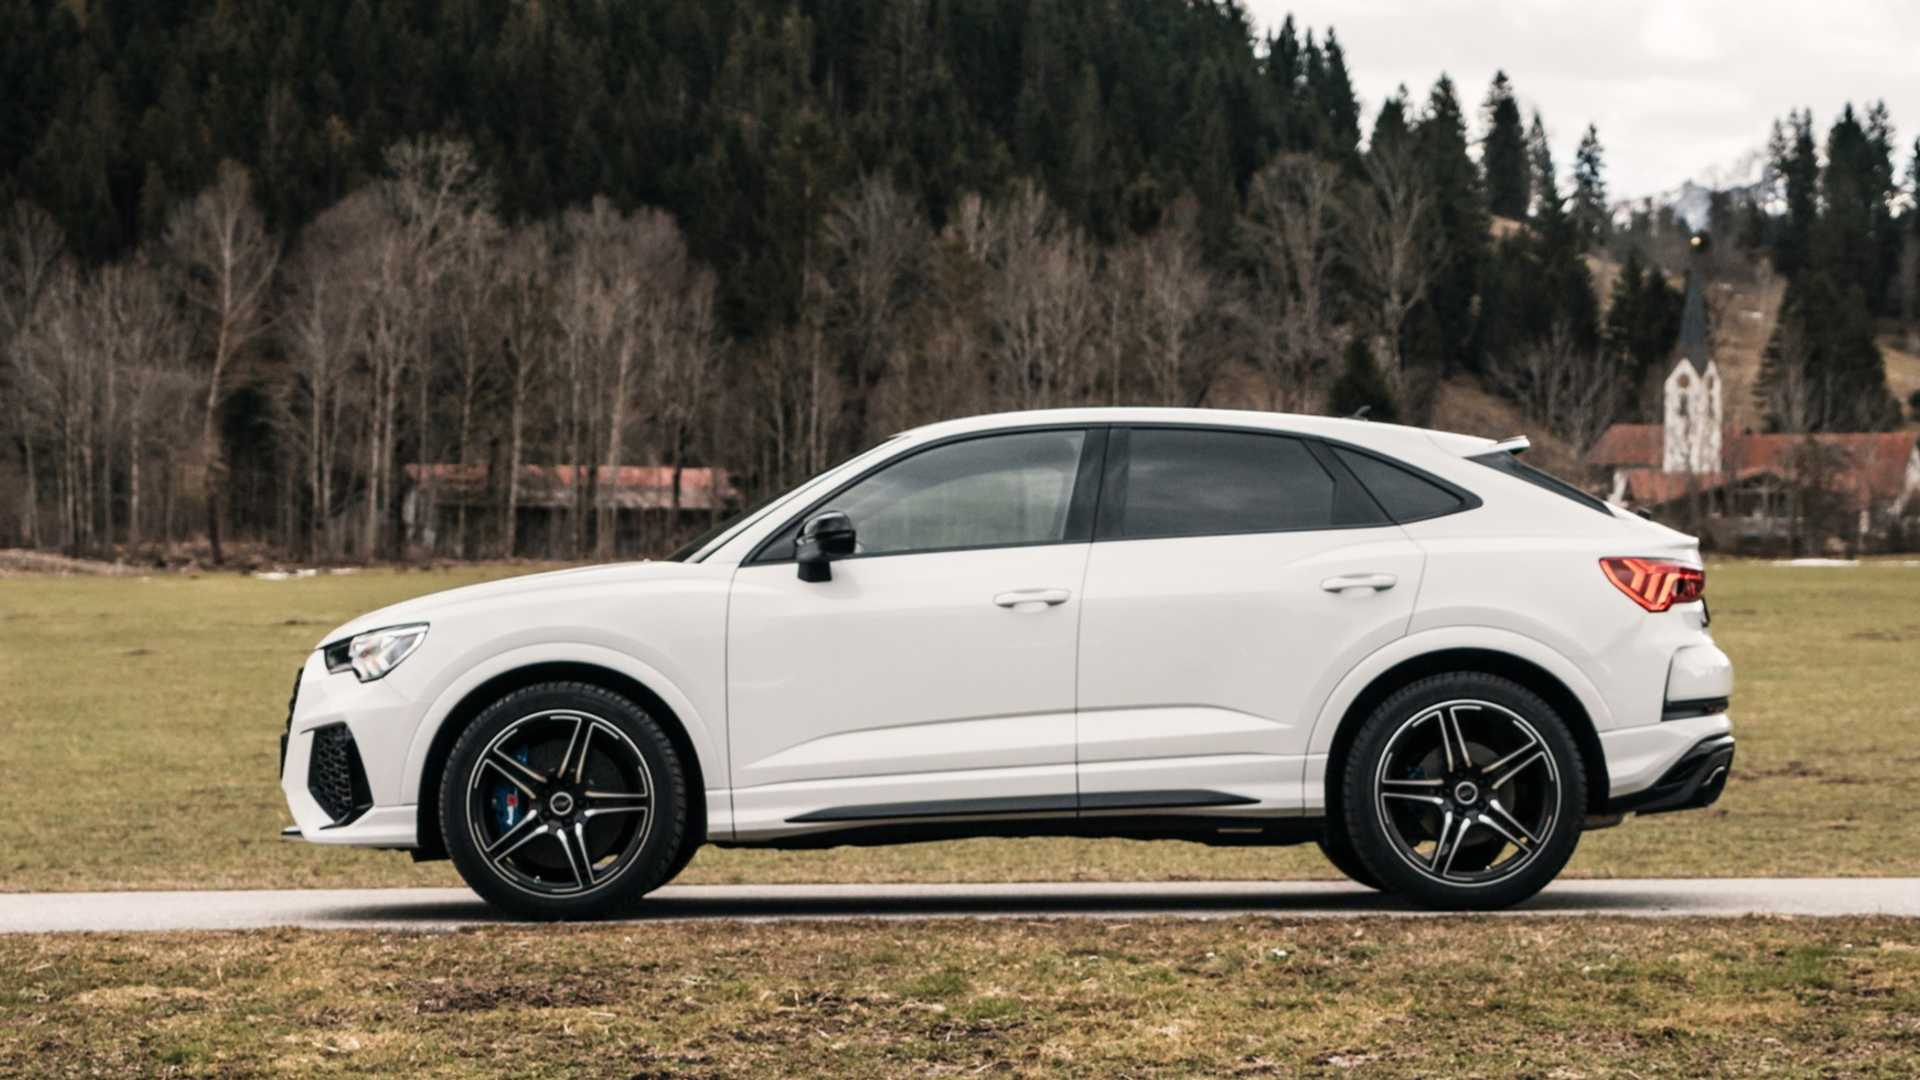 Audi-RS-Q3-Sportback-by-ABT-3